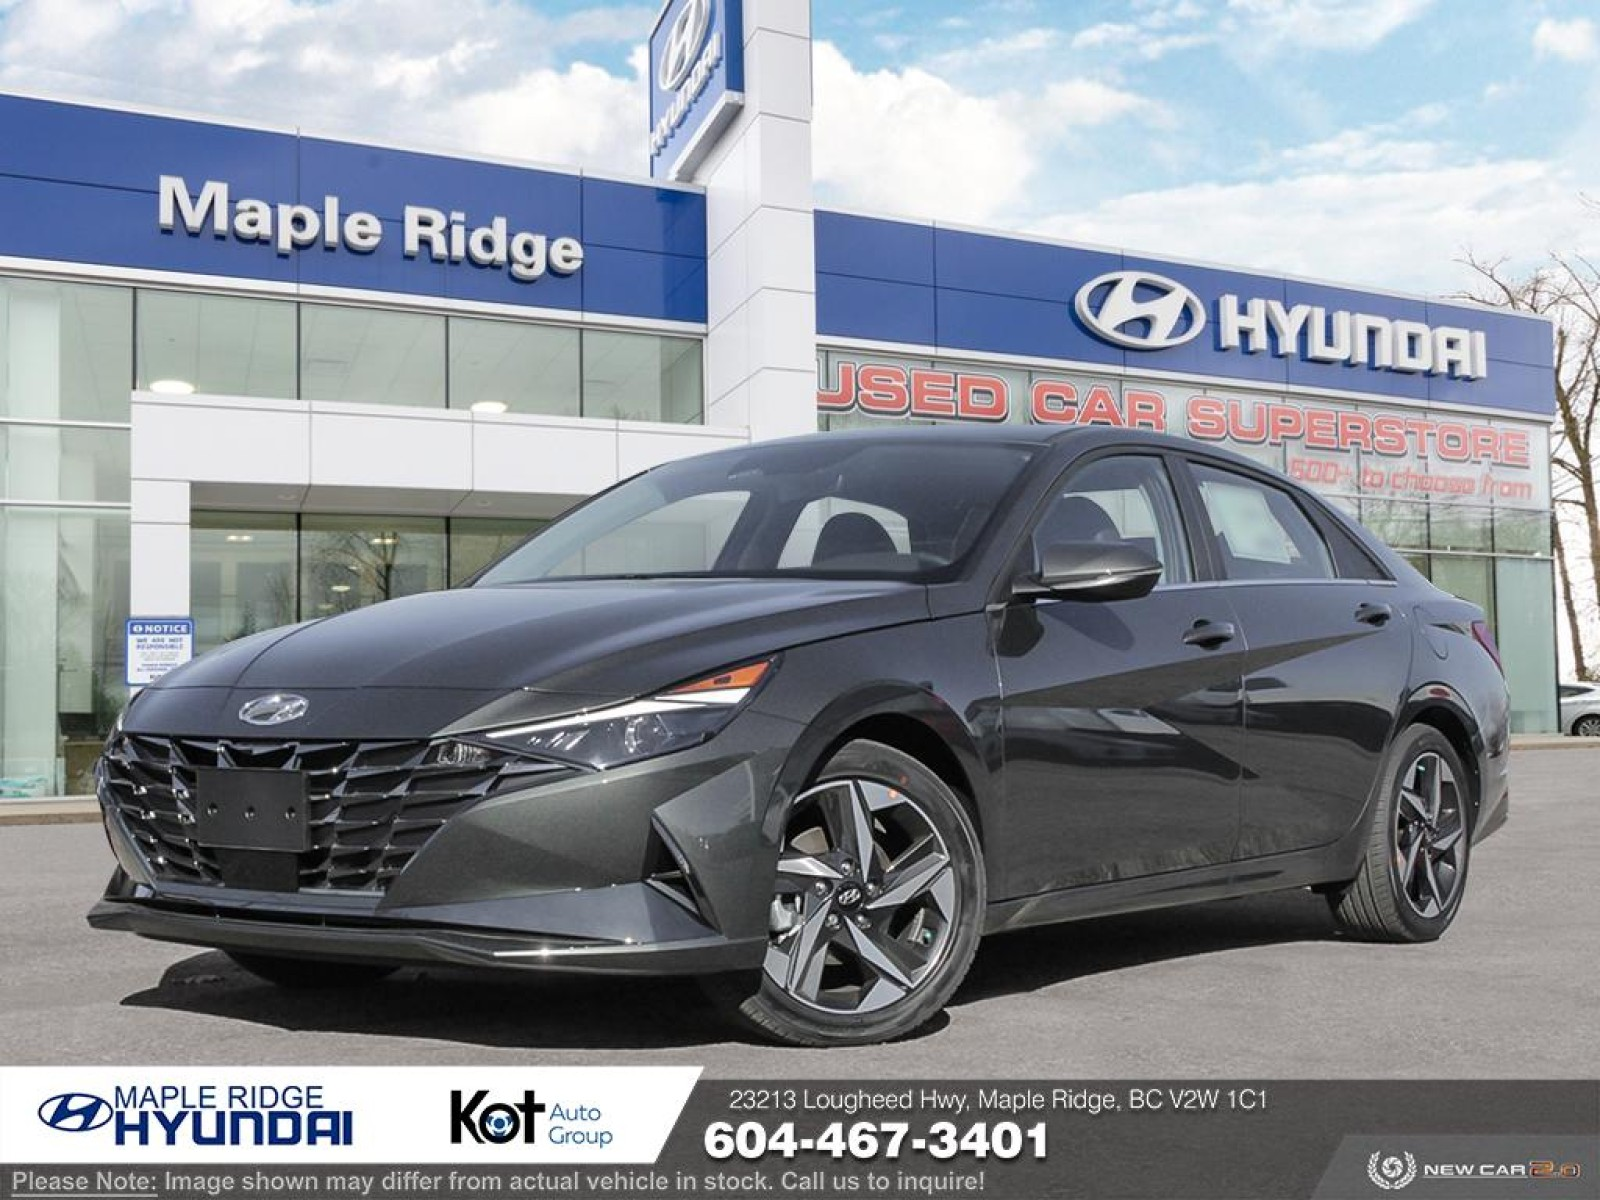 New 2021 Hyundai Elantra Ultimate IVT